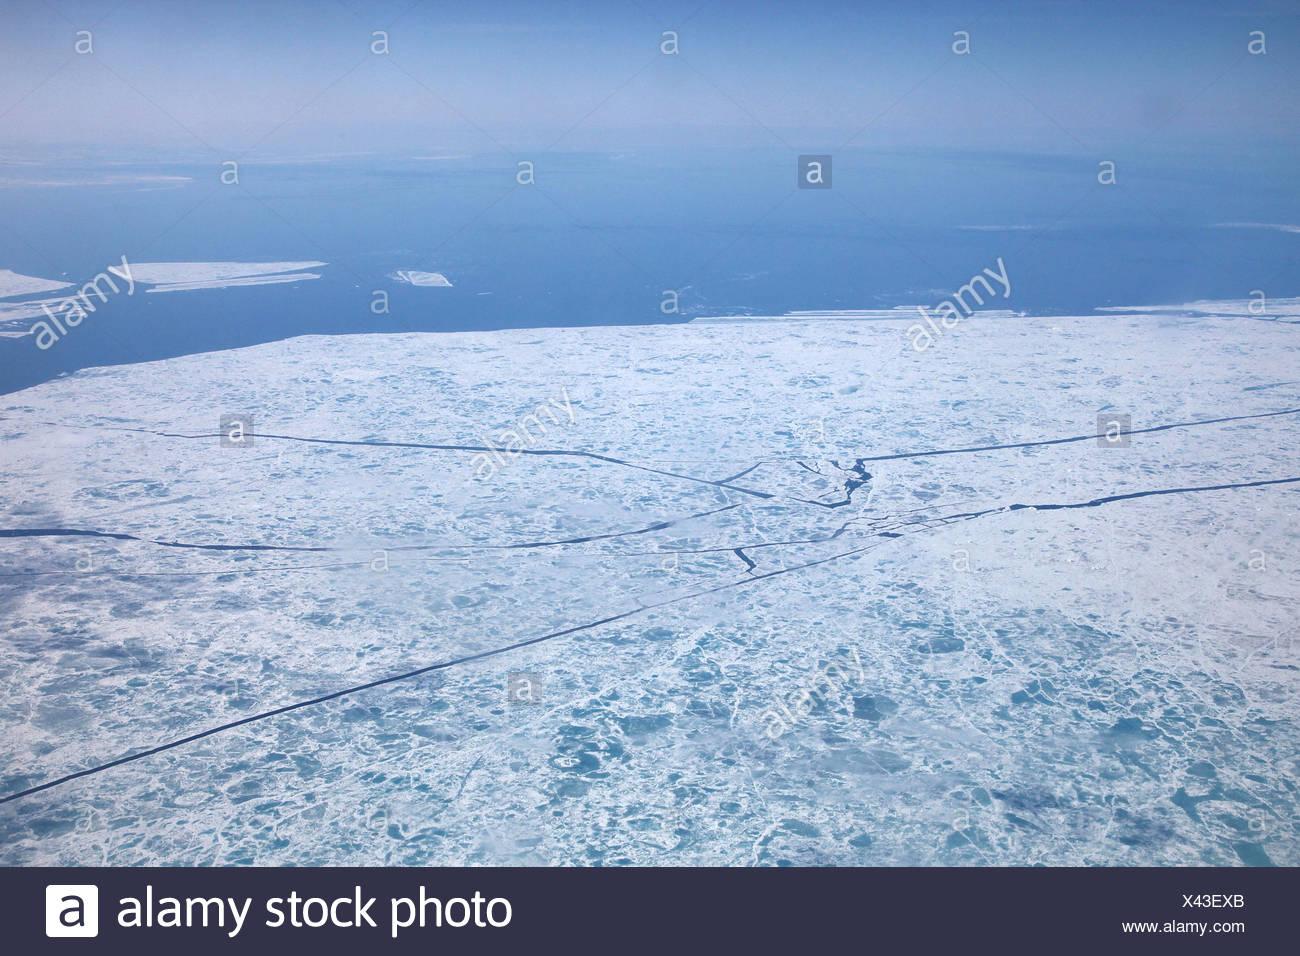 the ice is breaking, Canada, Nunavut Stock Photo